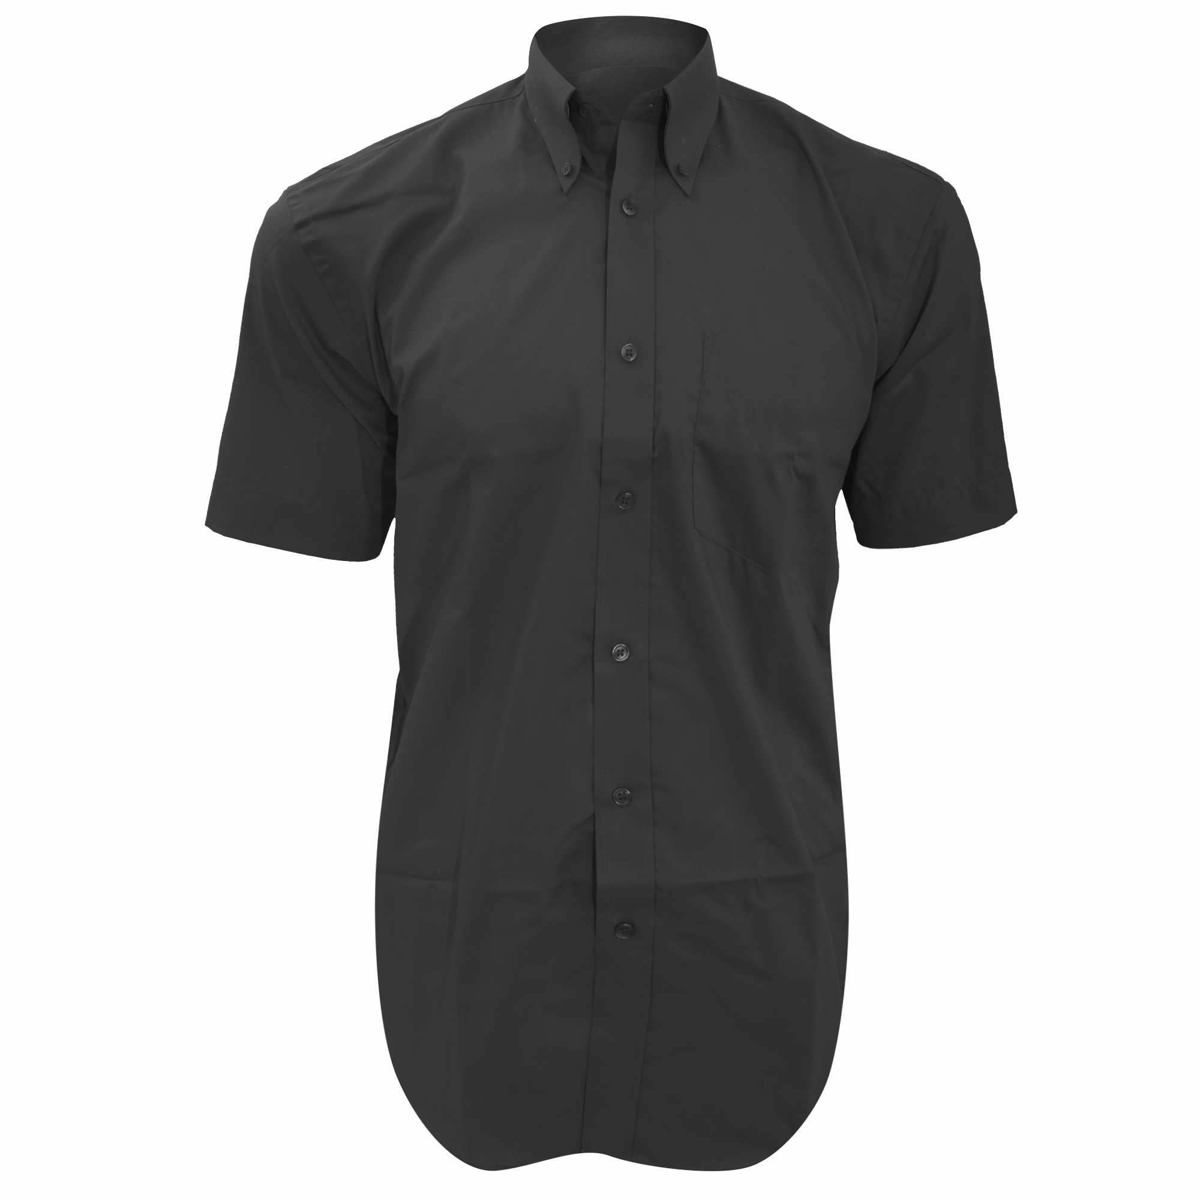 Kustom Kit Mens Short Sleeve Corporate Oxford Shirt (21inch) (Charcoal)